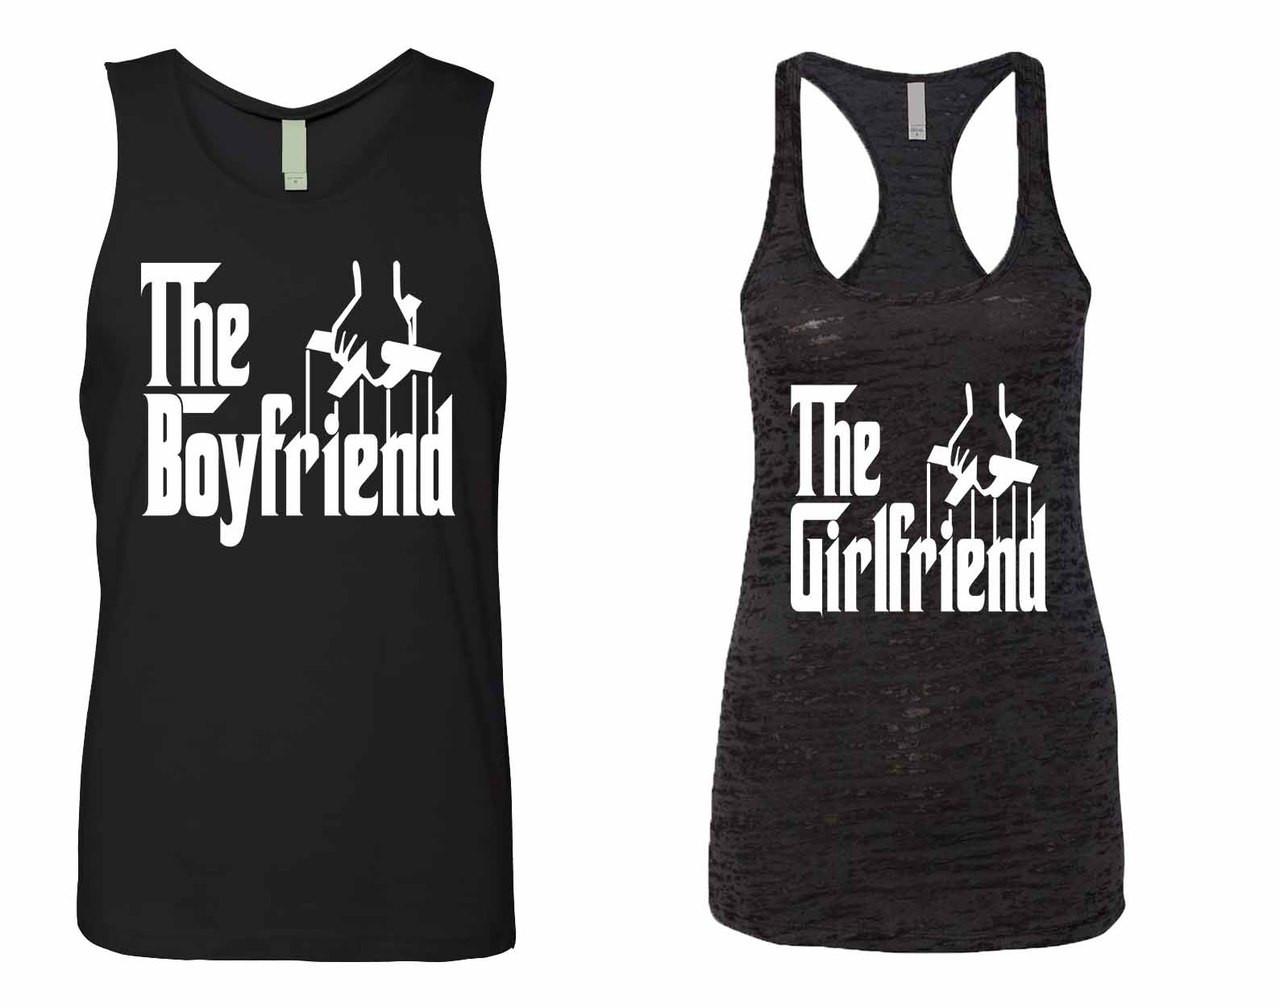 c577d30492ed9 The boyfriend Jersey The girlfriend Burnout Tank Top couples gift shirts